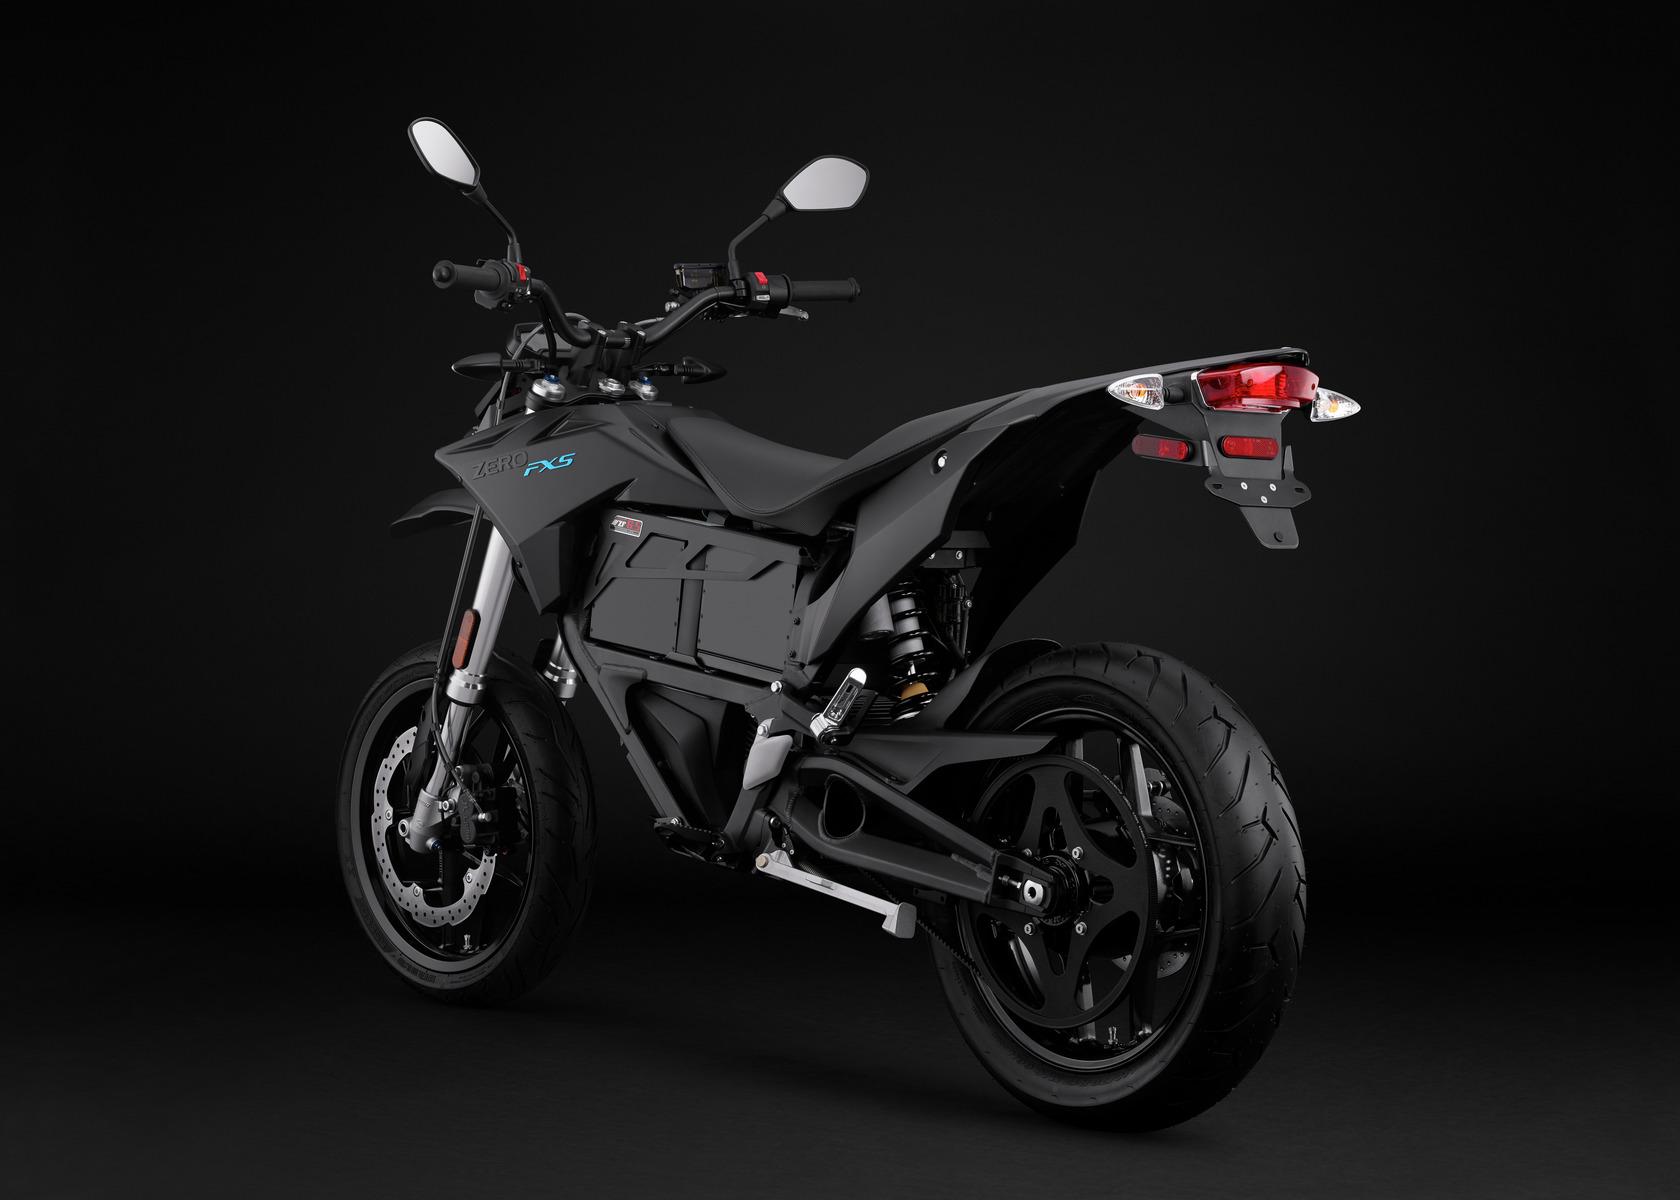 Foto Zero Motorcycles Zero FXS 2017 ZF6.5